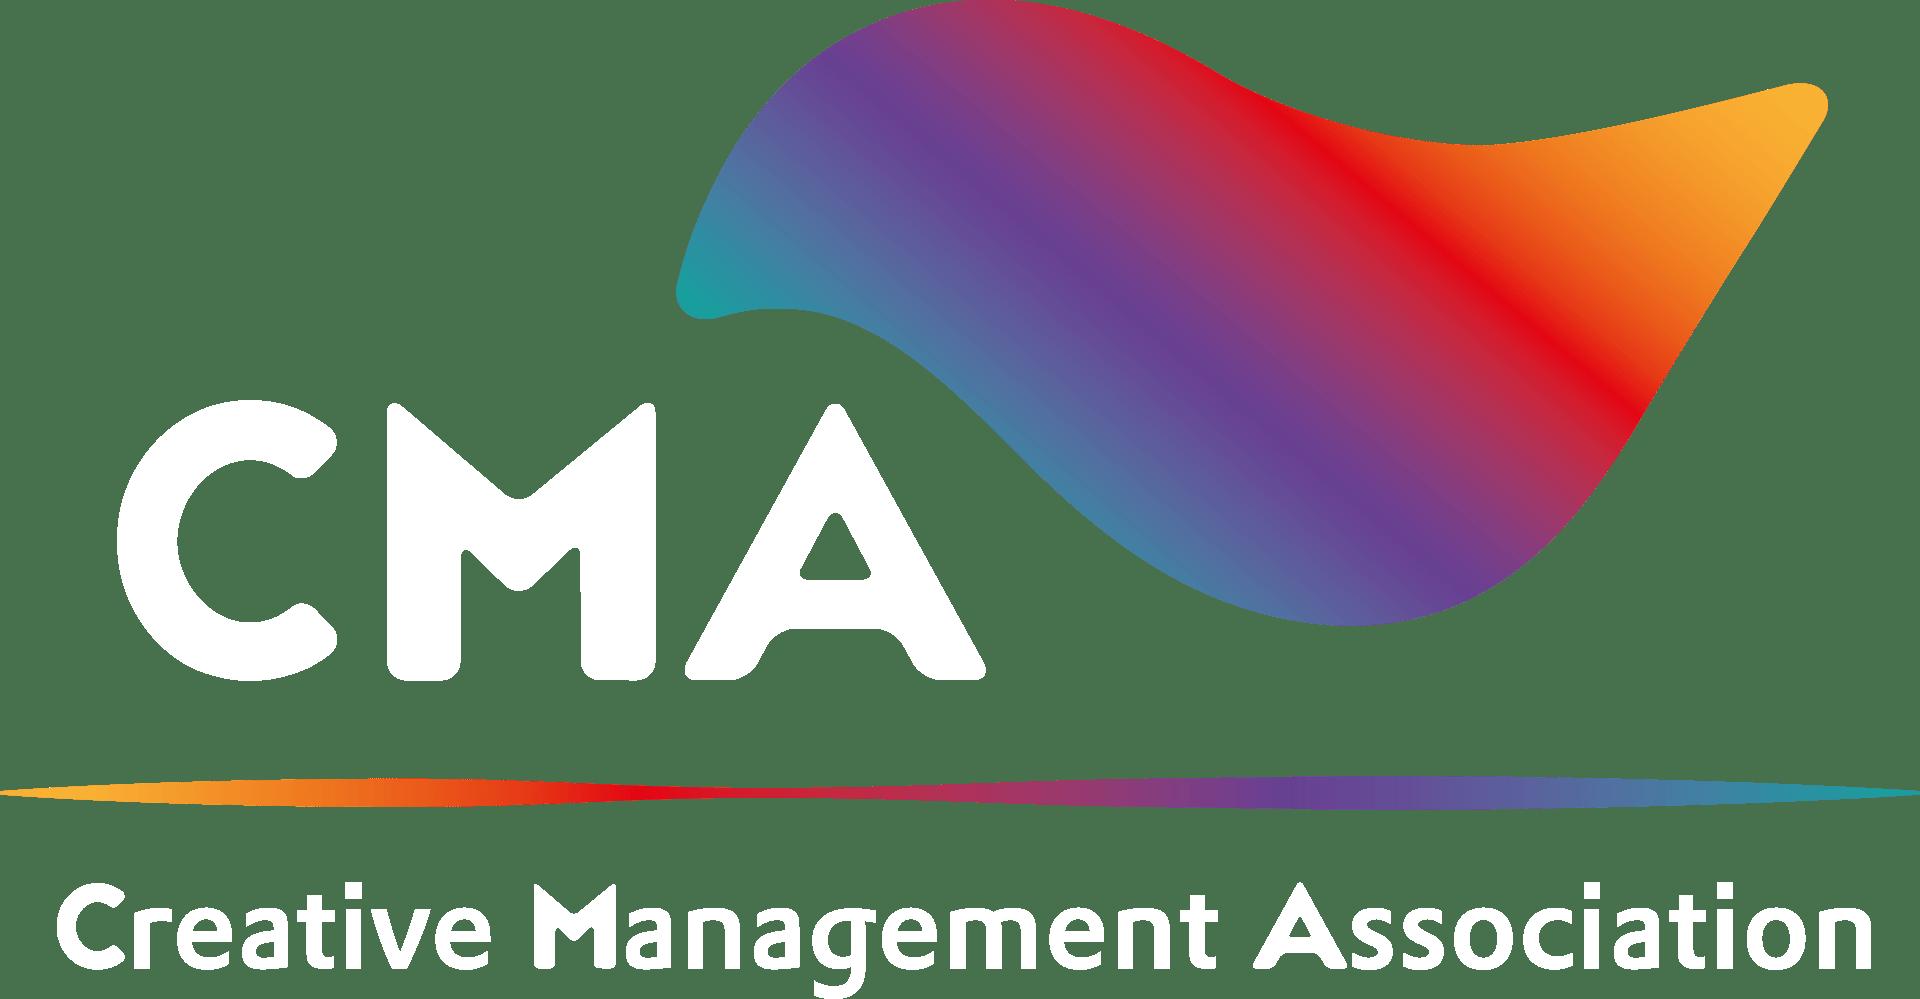 CMA - Creative Management Association